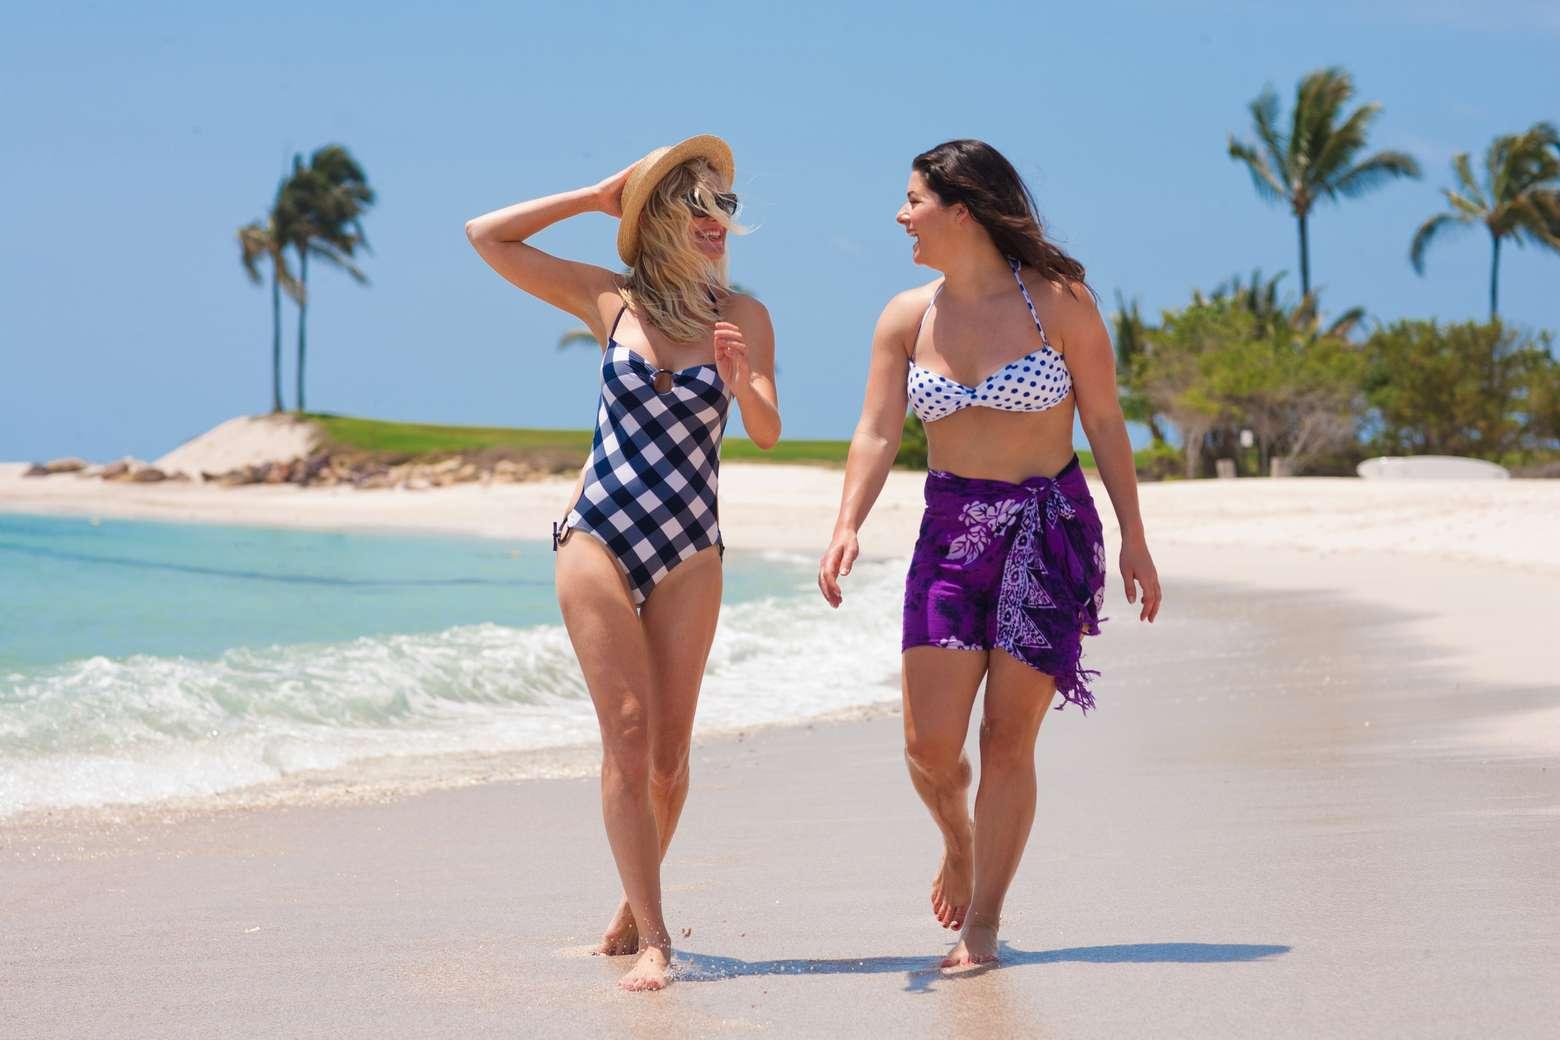 Мои фото с пляжа с подругой